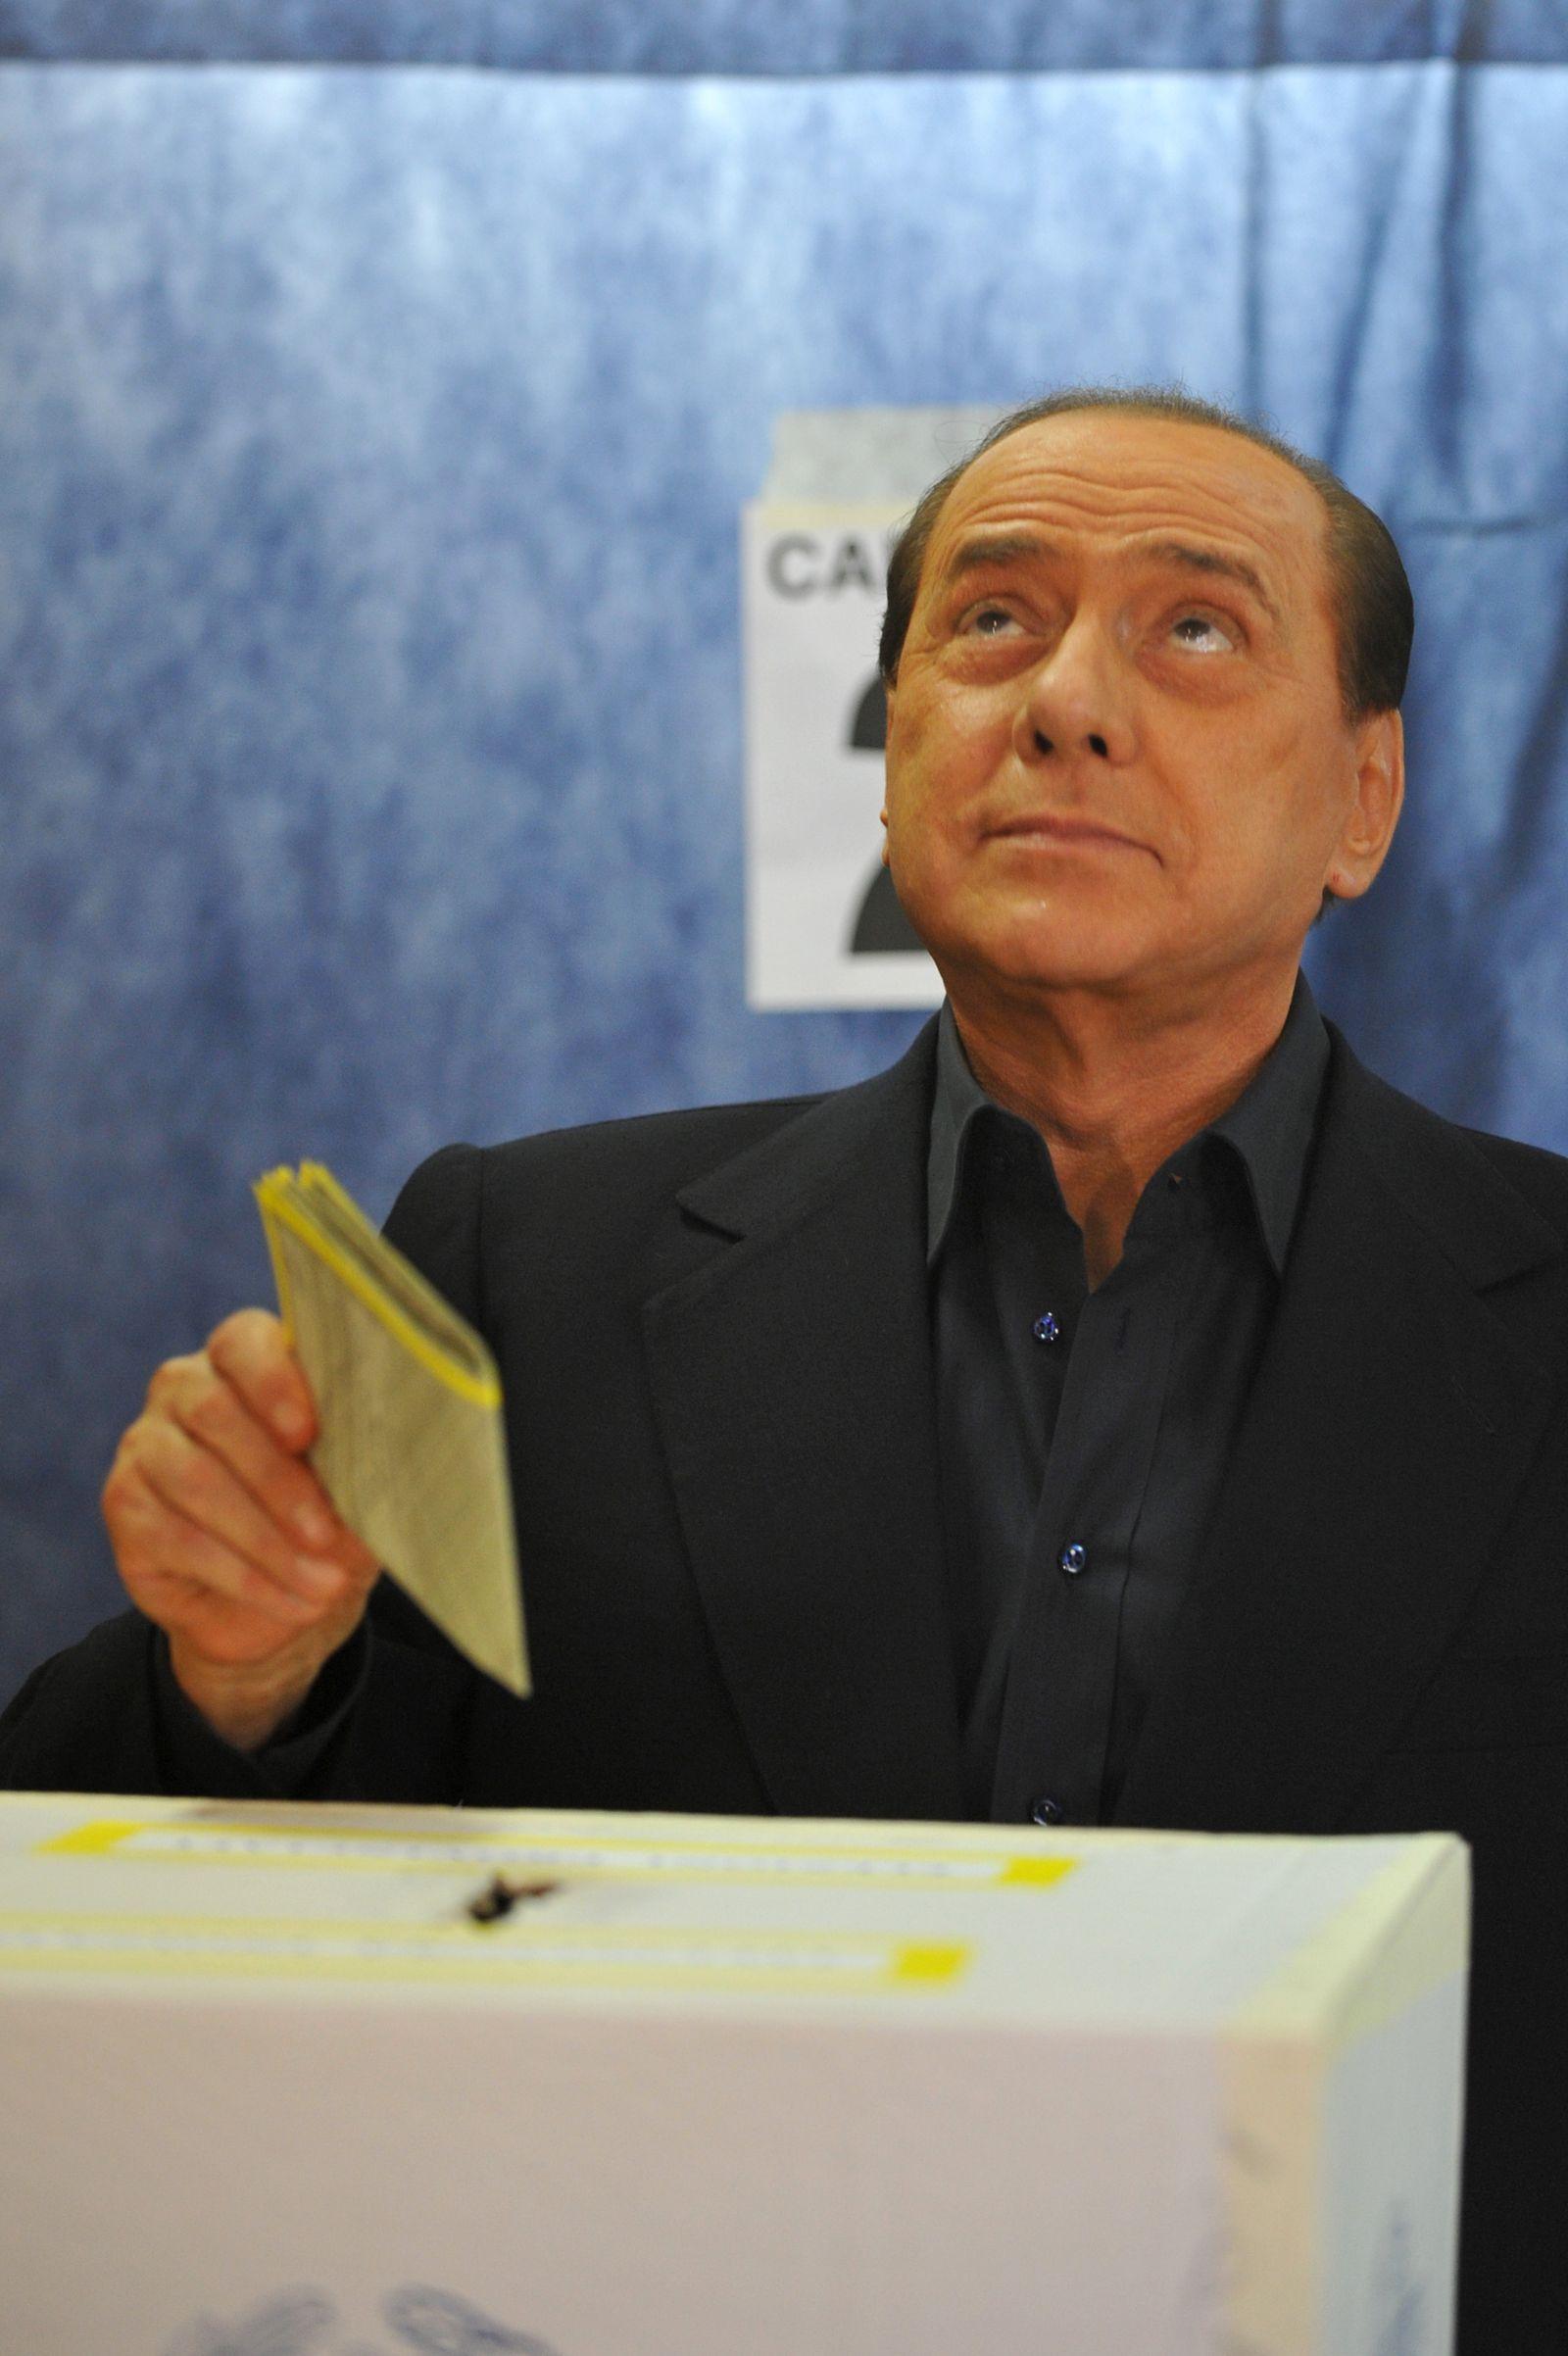 Silvio Berlusconi Europawahl